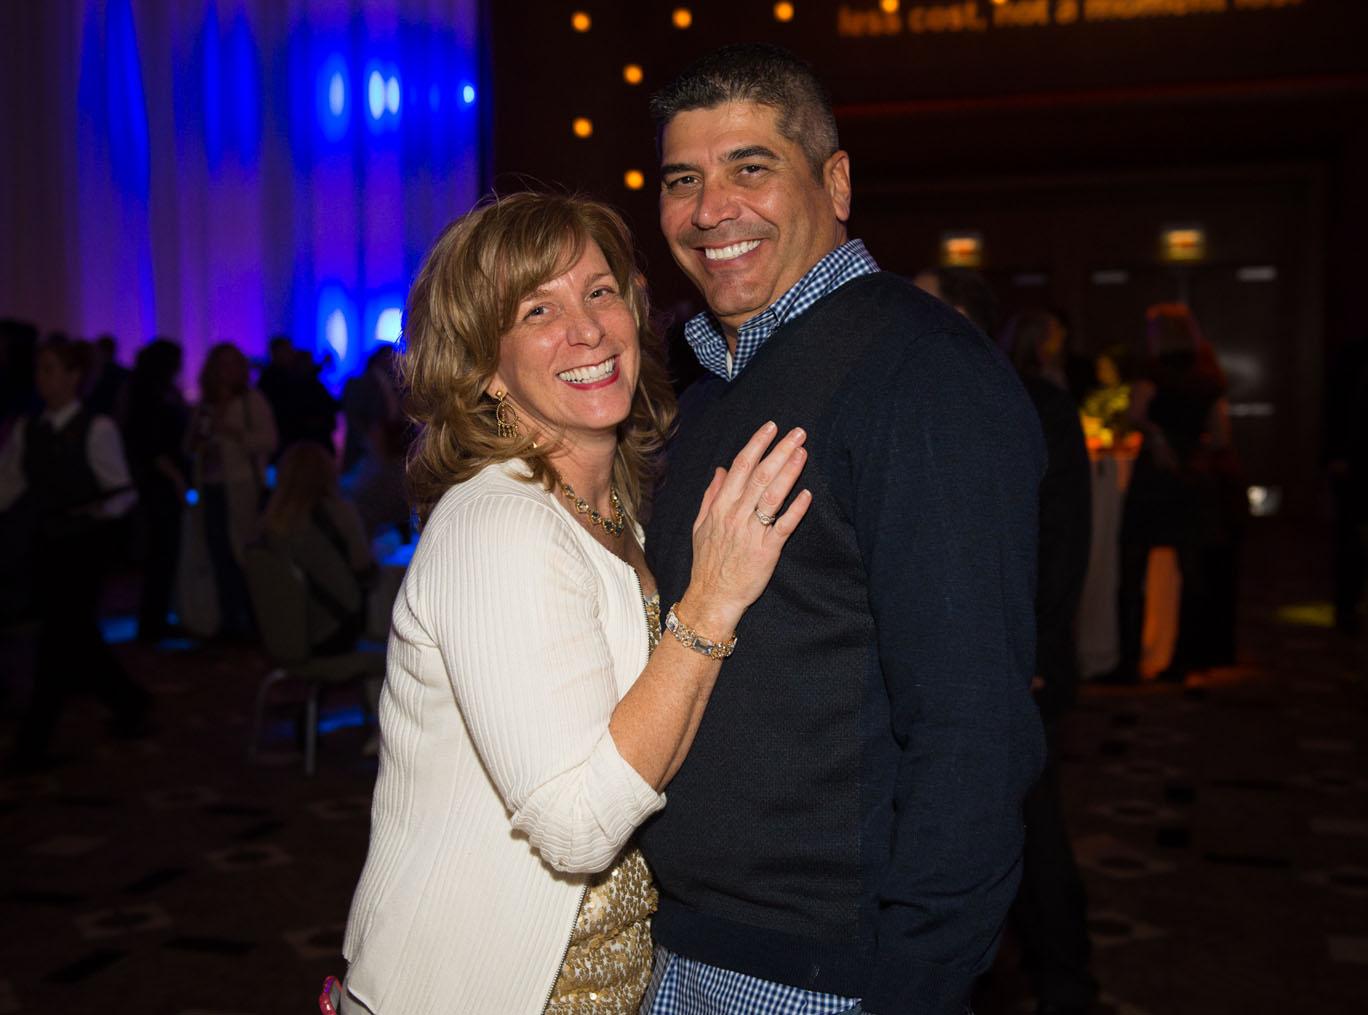 2015-12-09 ReMax Corpoarte Event - The Borgata - Atlantic City NJ - Photo Sesh - 2015-5205.jpg